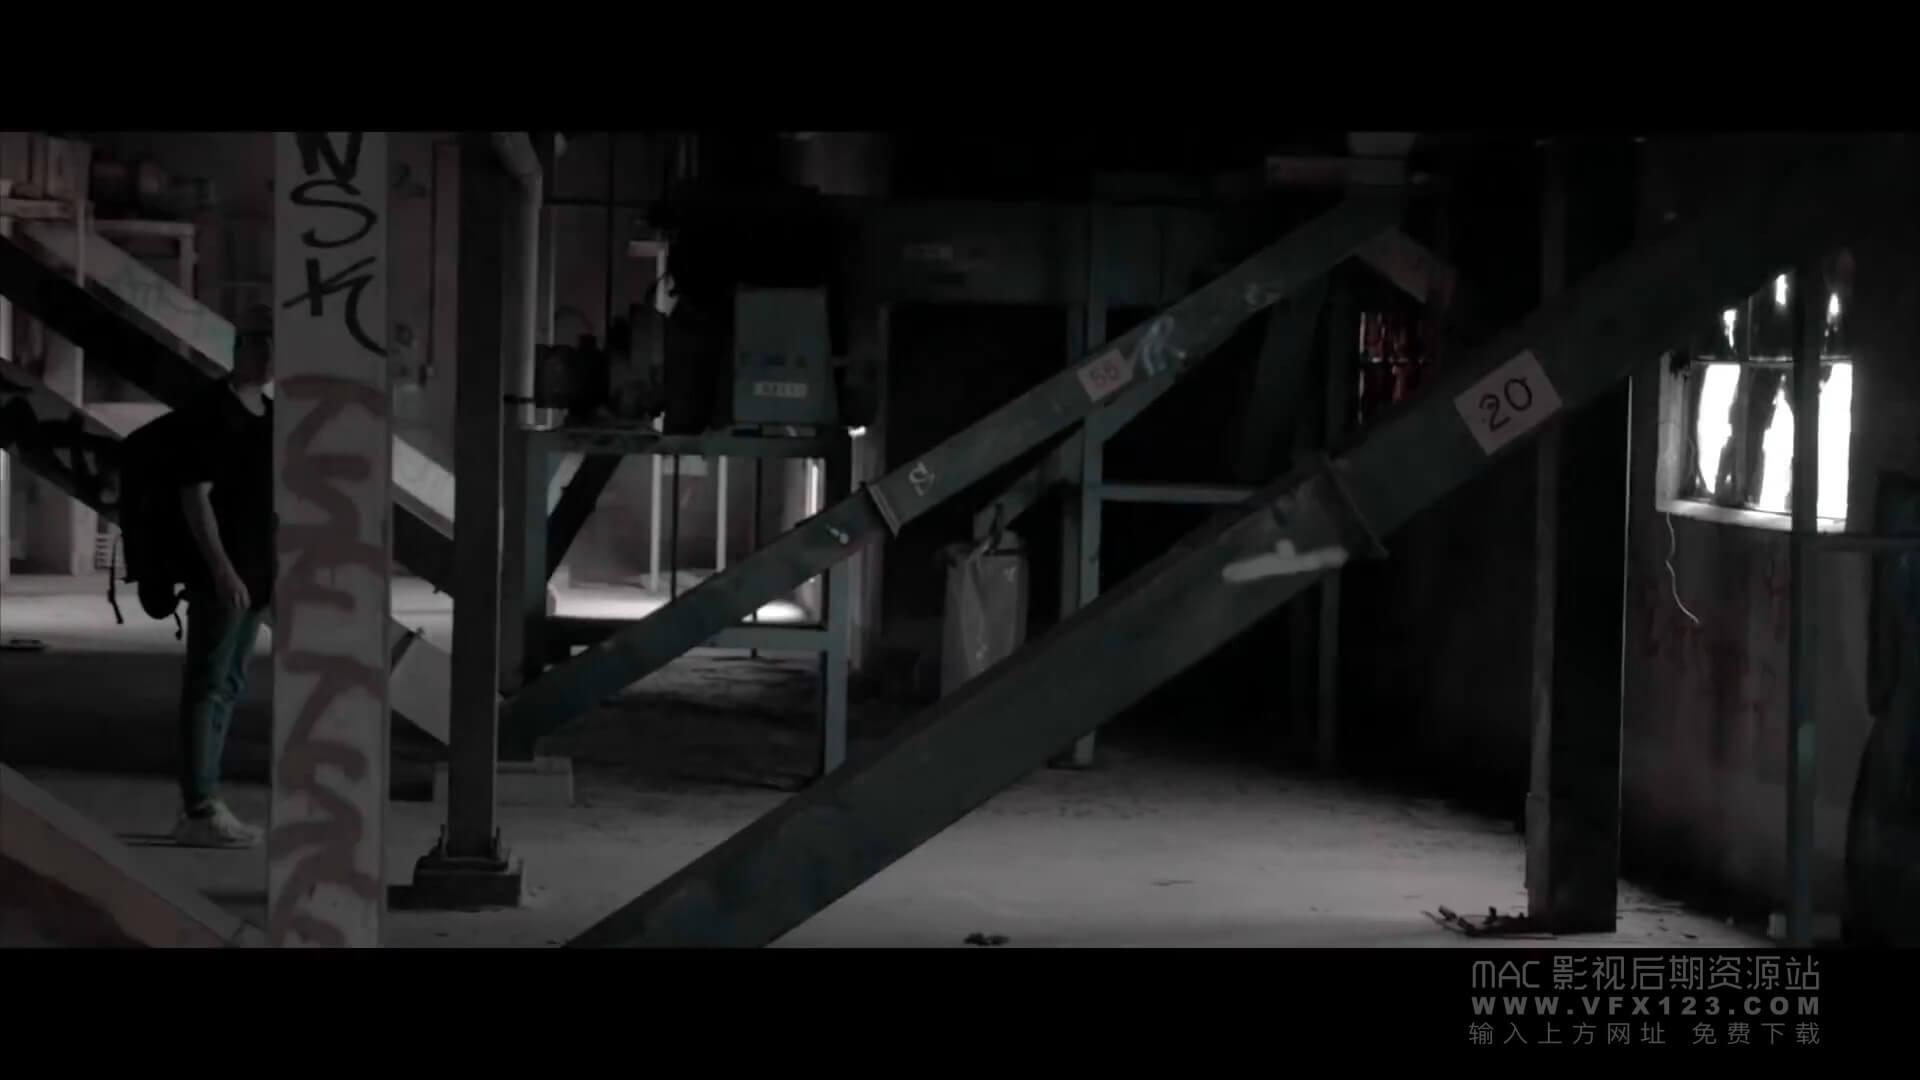 FCPX快速模糊转场插件 Quick Blur Transitions 免费下载